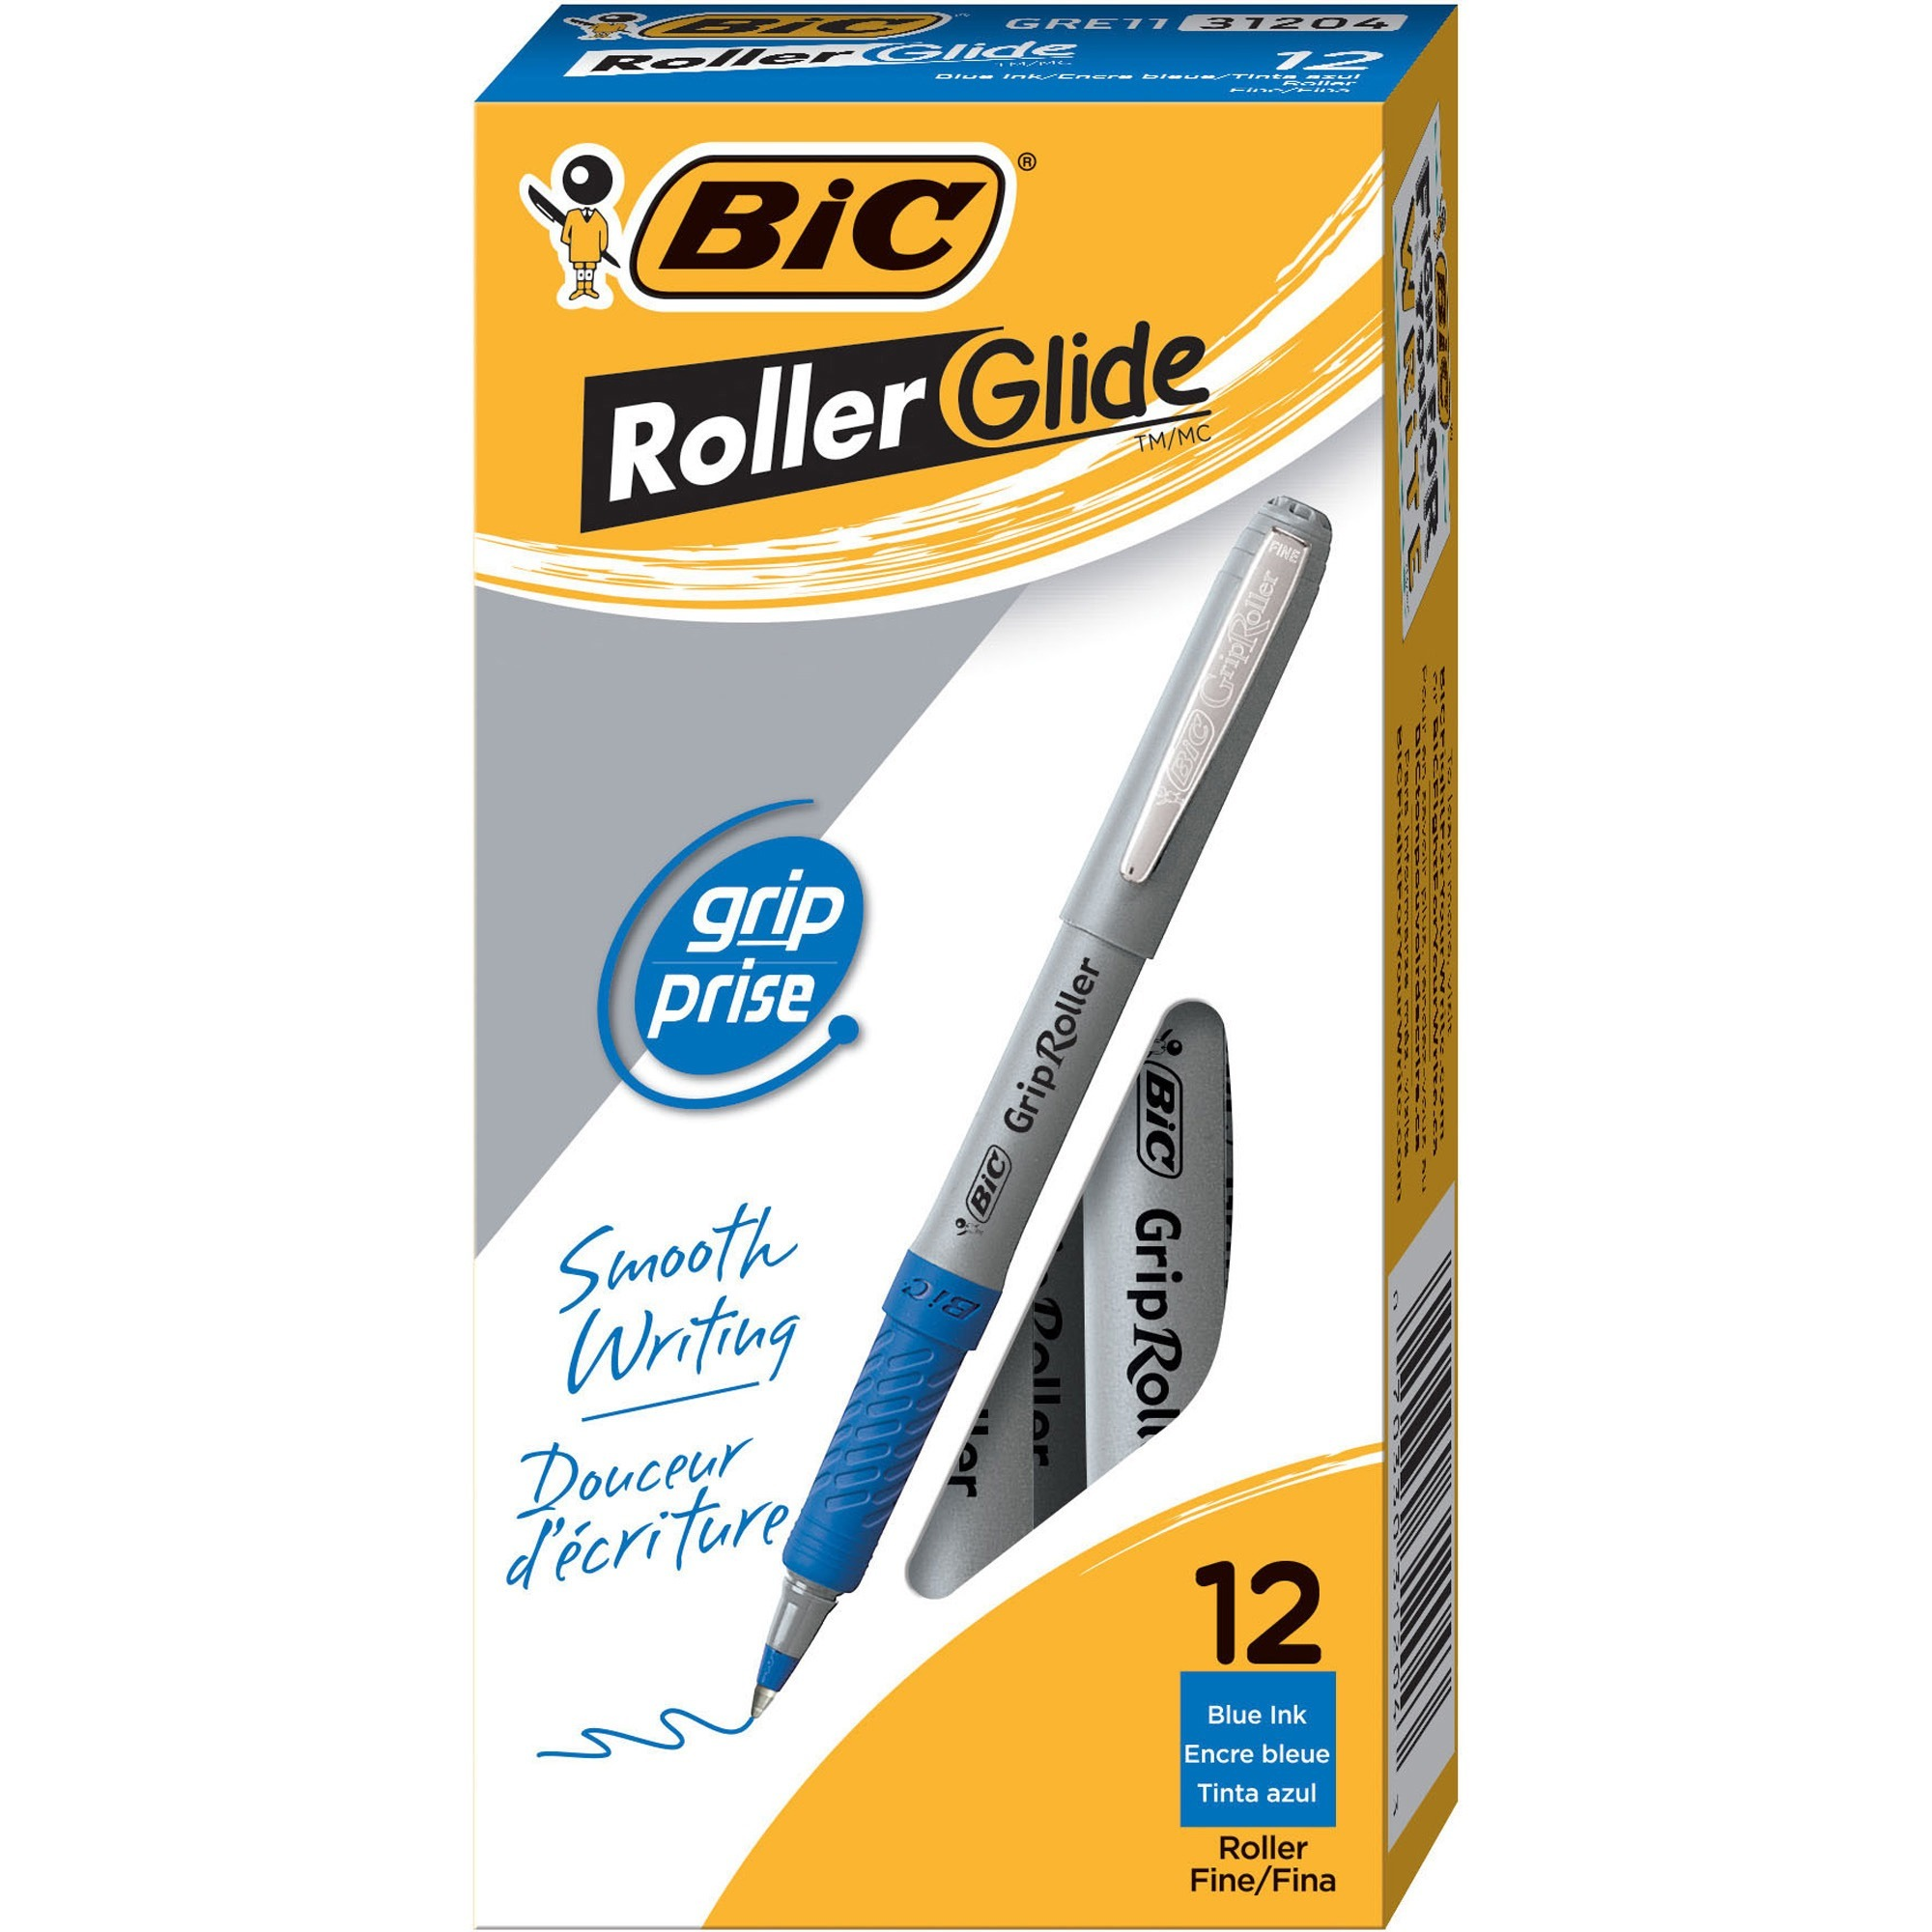 Bic Roller Glide Deco Roller Ball Pen Fine Point